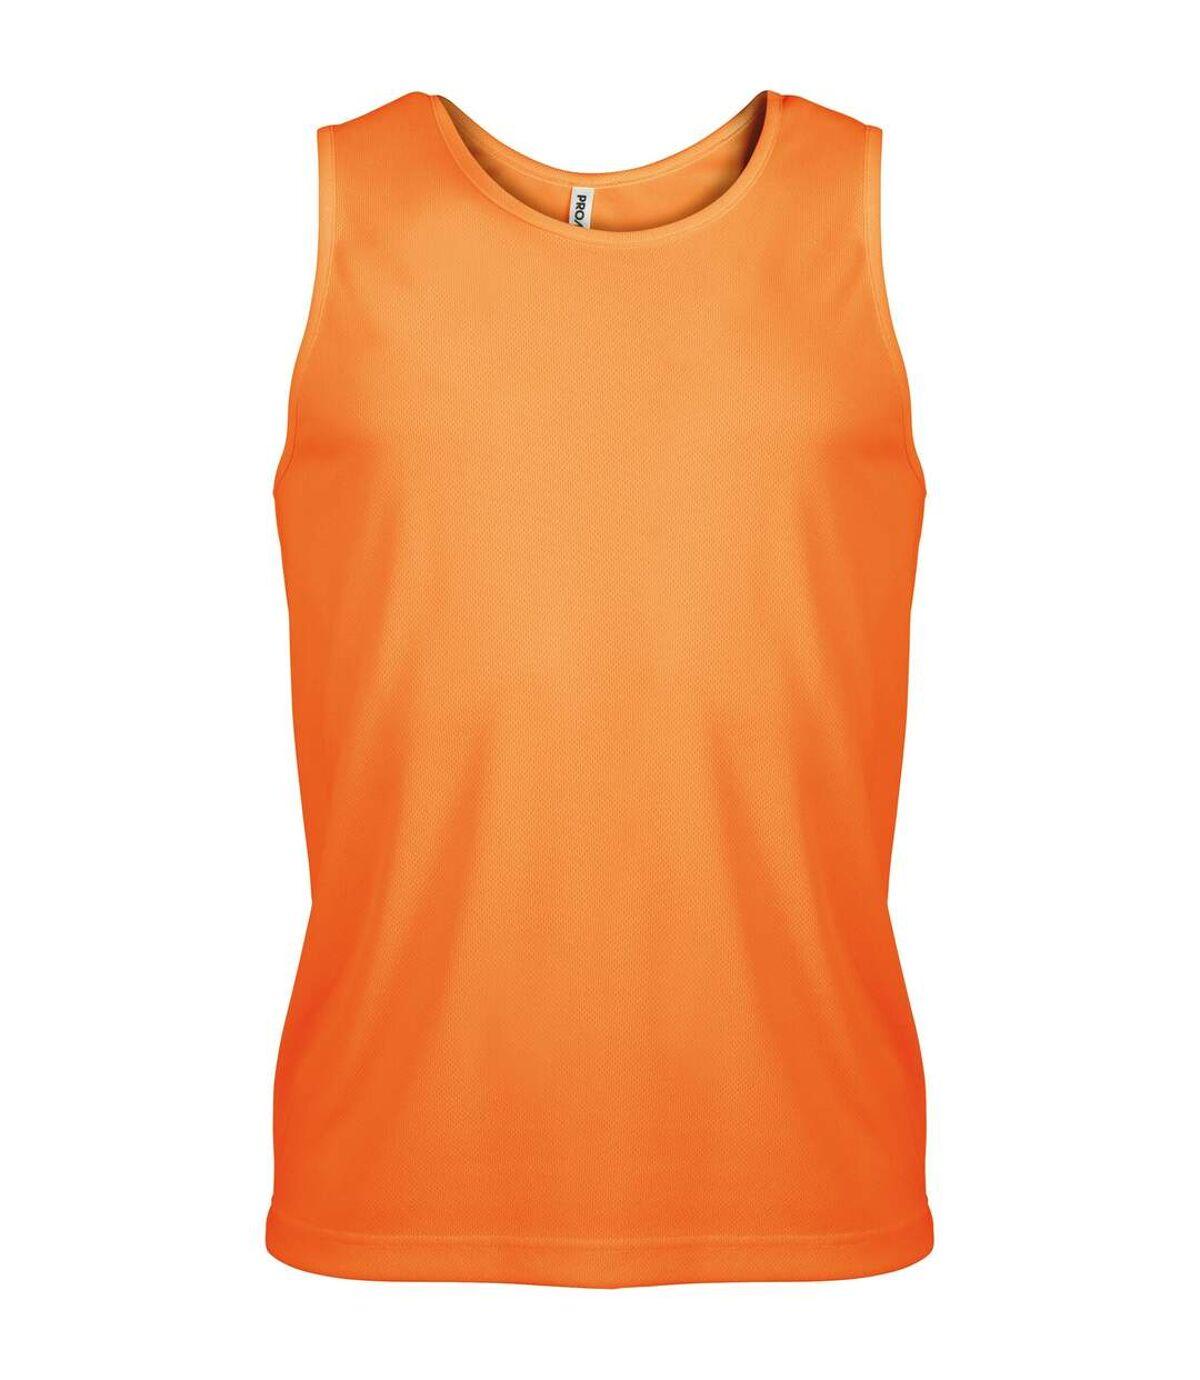 Kariban Proact Mens Sleeveless Sports Training Vest (Orange) - UTRW2719